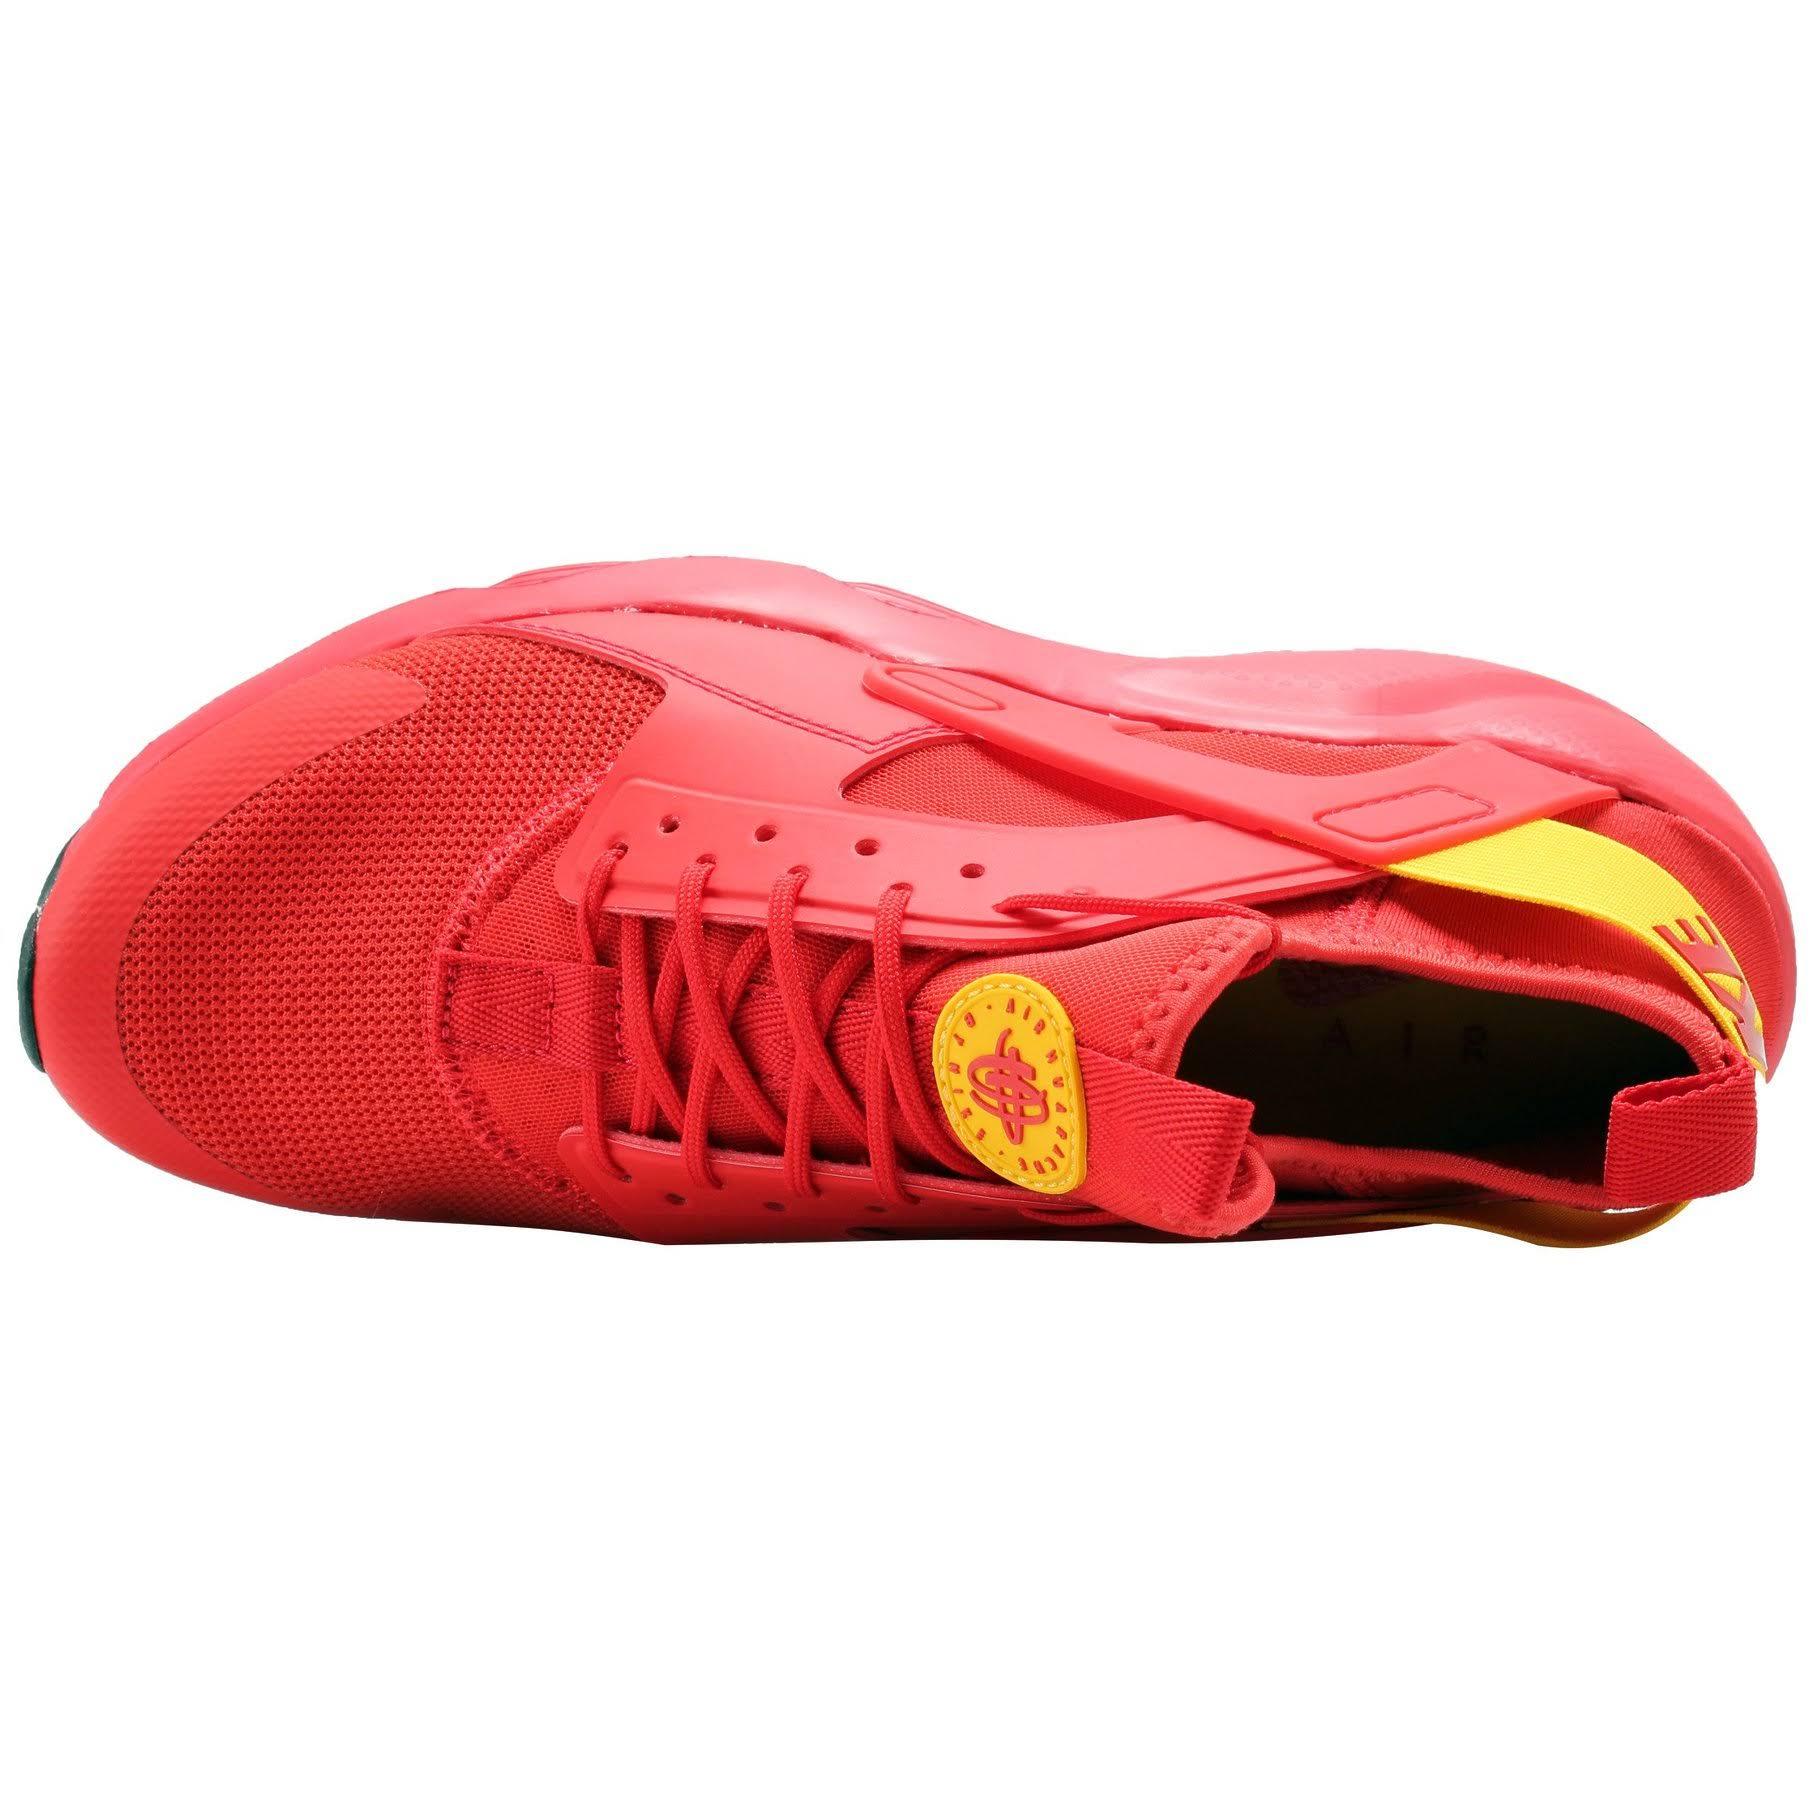 Huarache Mens Ultra University Run Redamarillo Nike Air Style819685 607 9eEHW2IDY